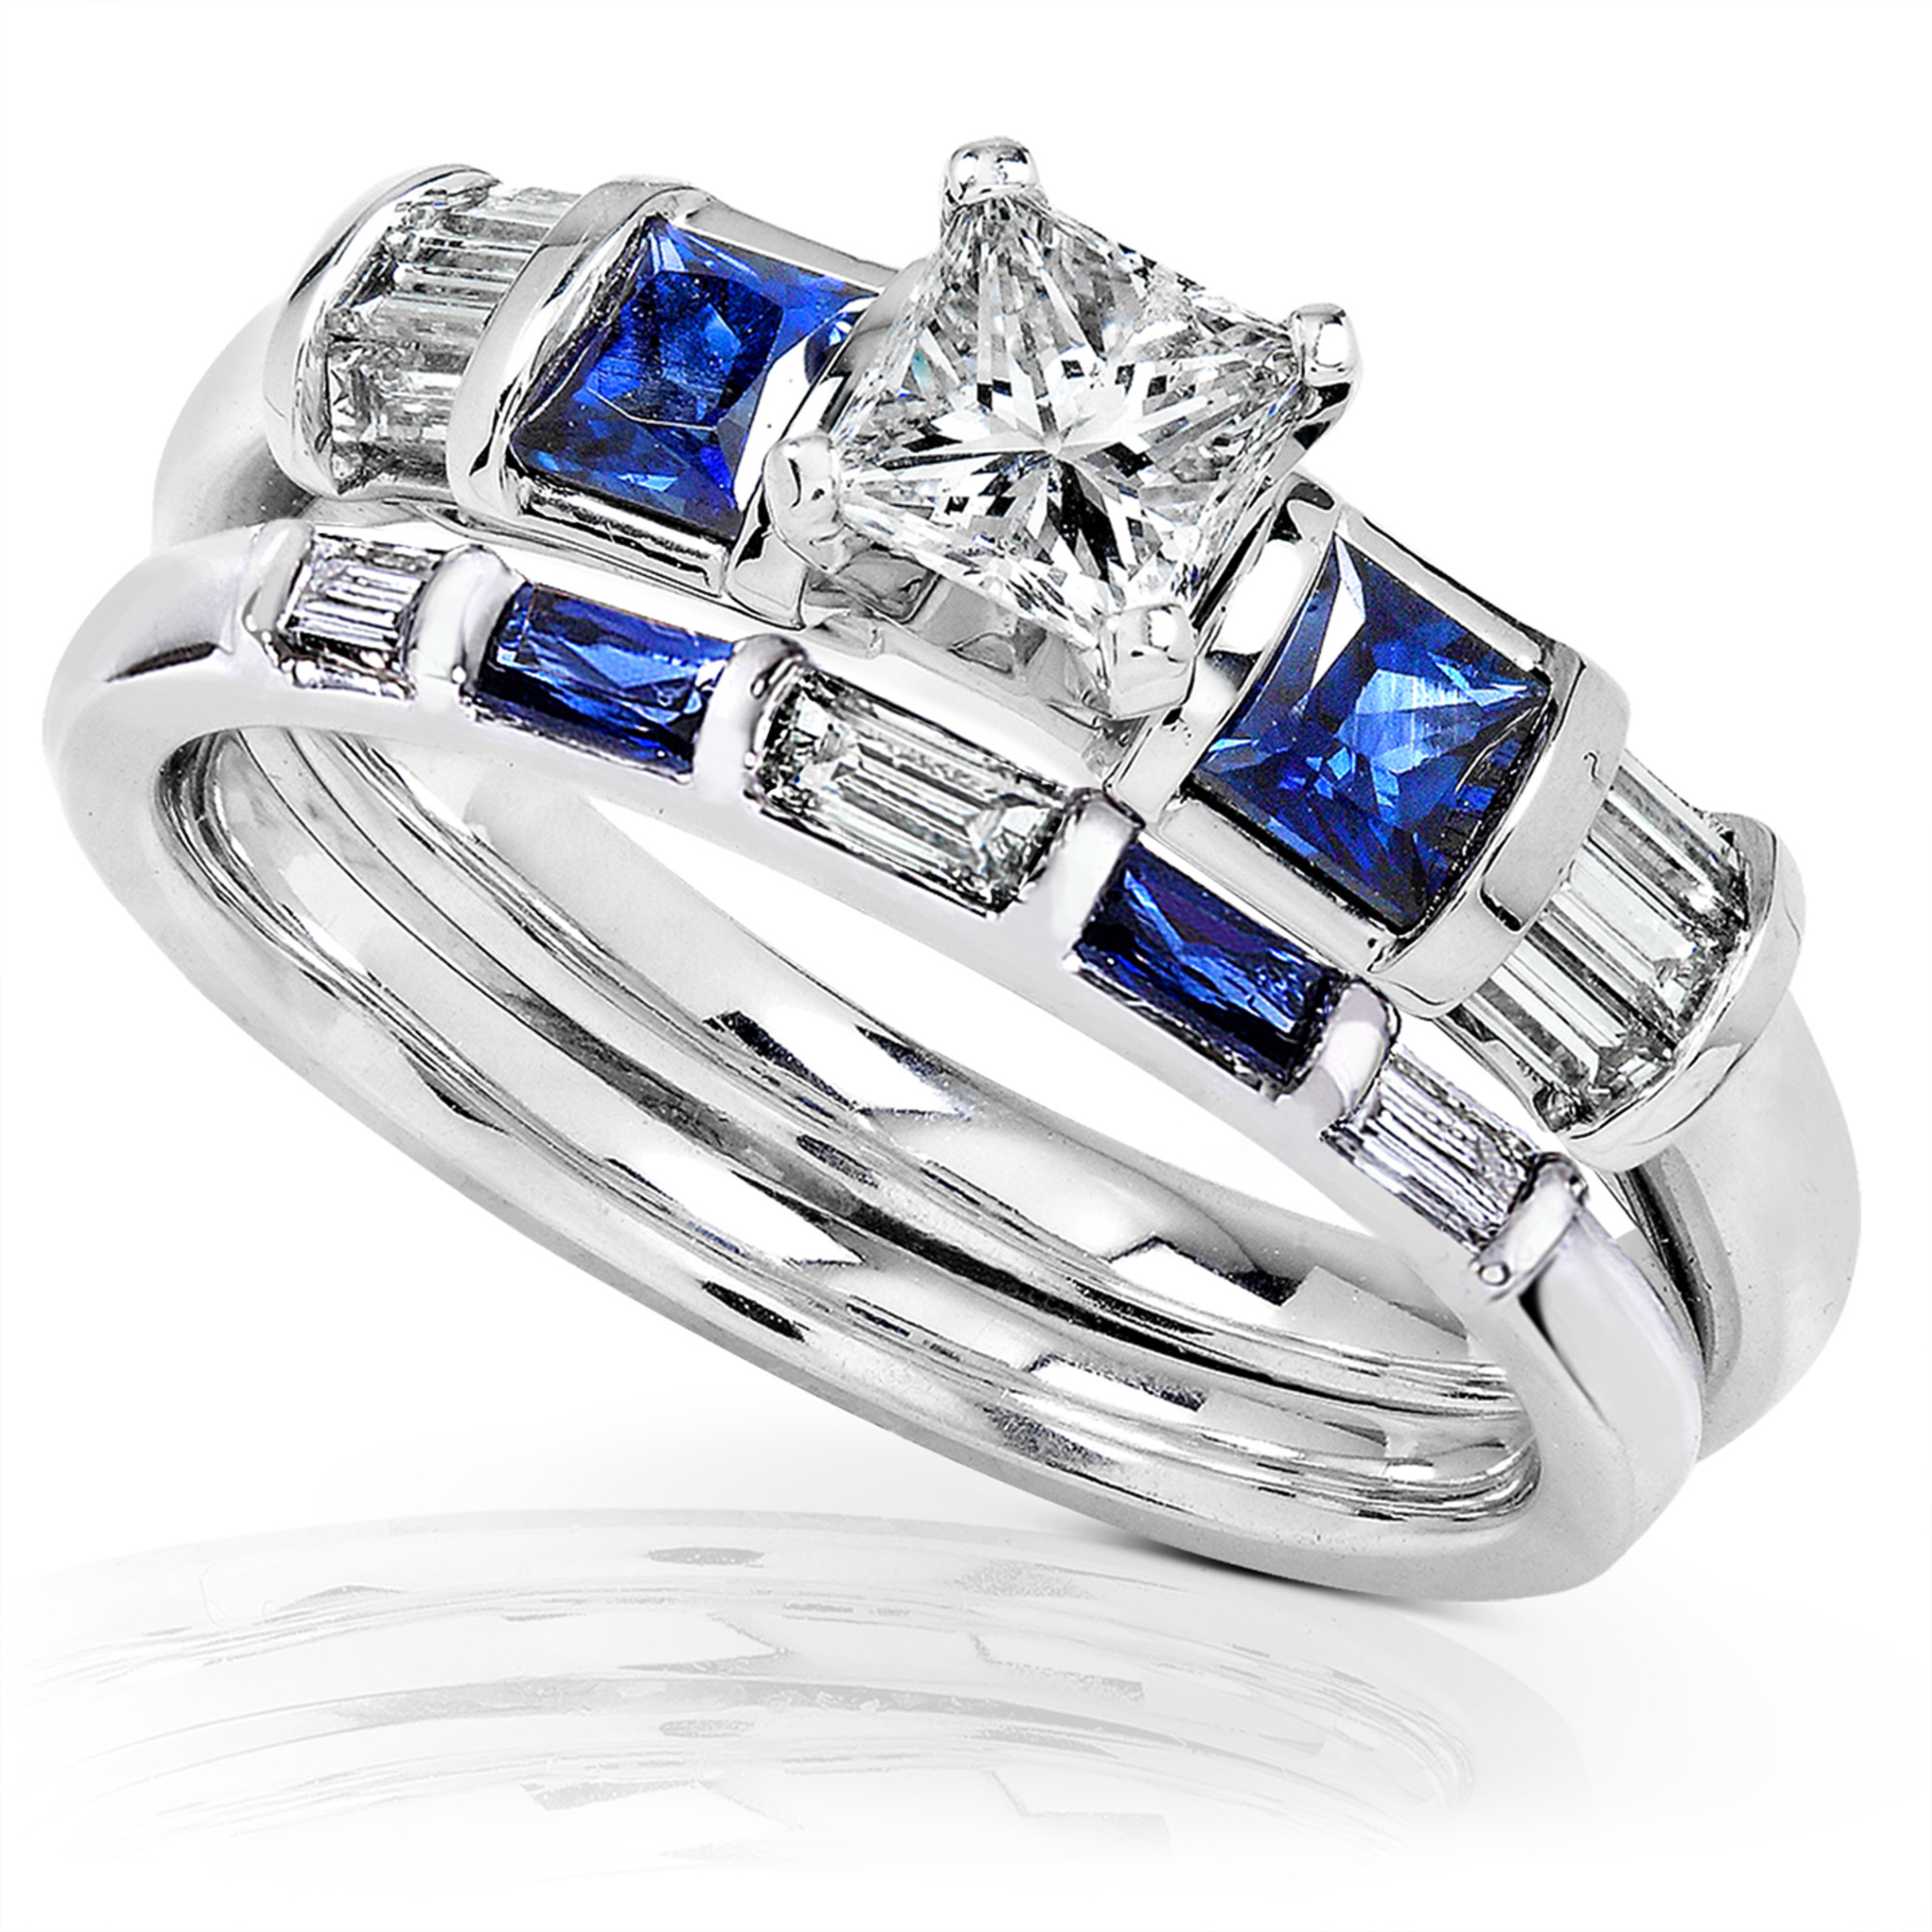 Blue Sapphire & Diamond Wedding Rings Set 1 Carat (ctw) In 14k White Gold by